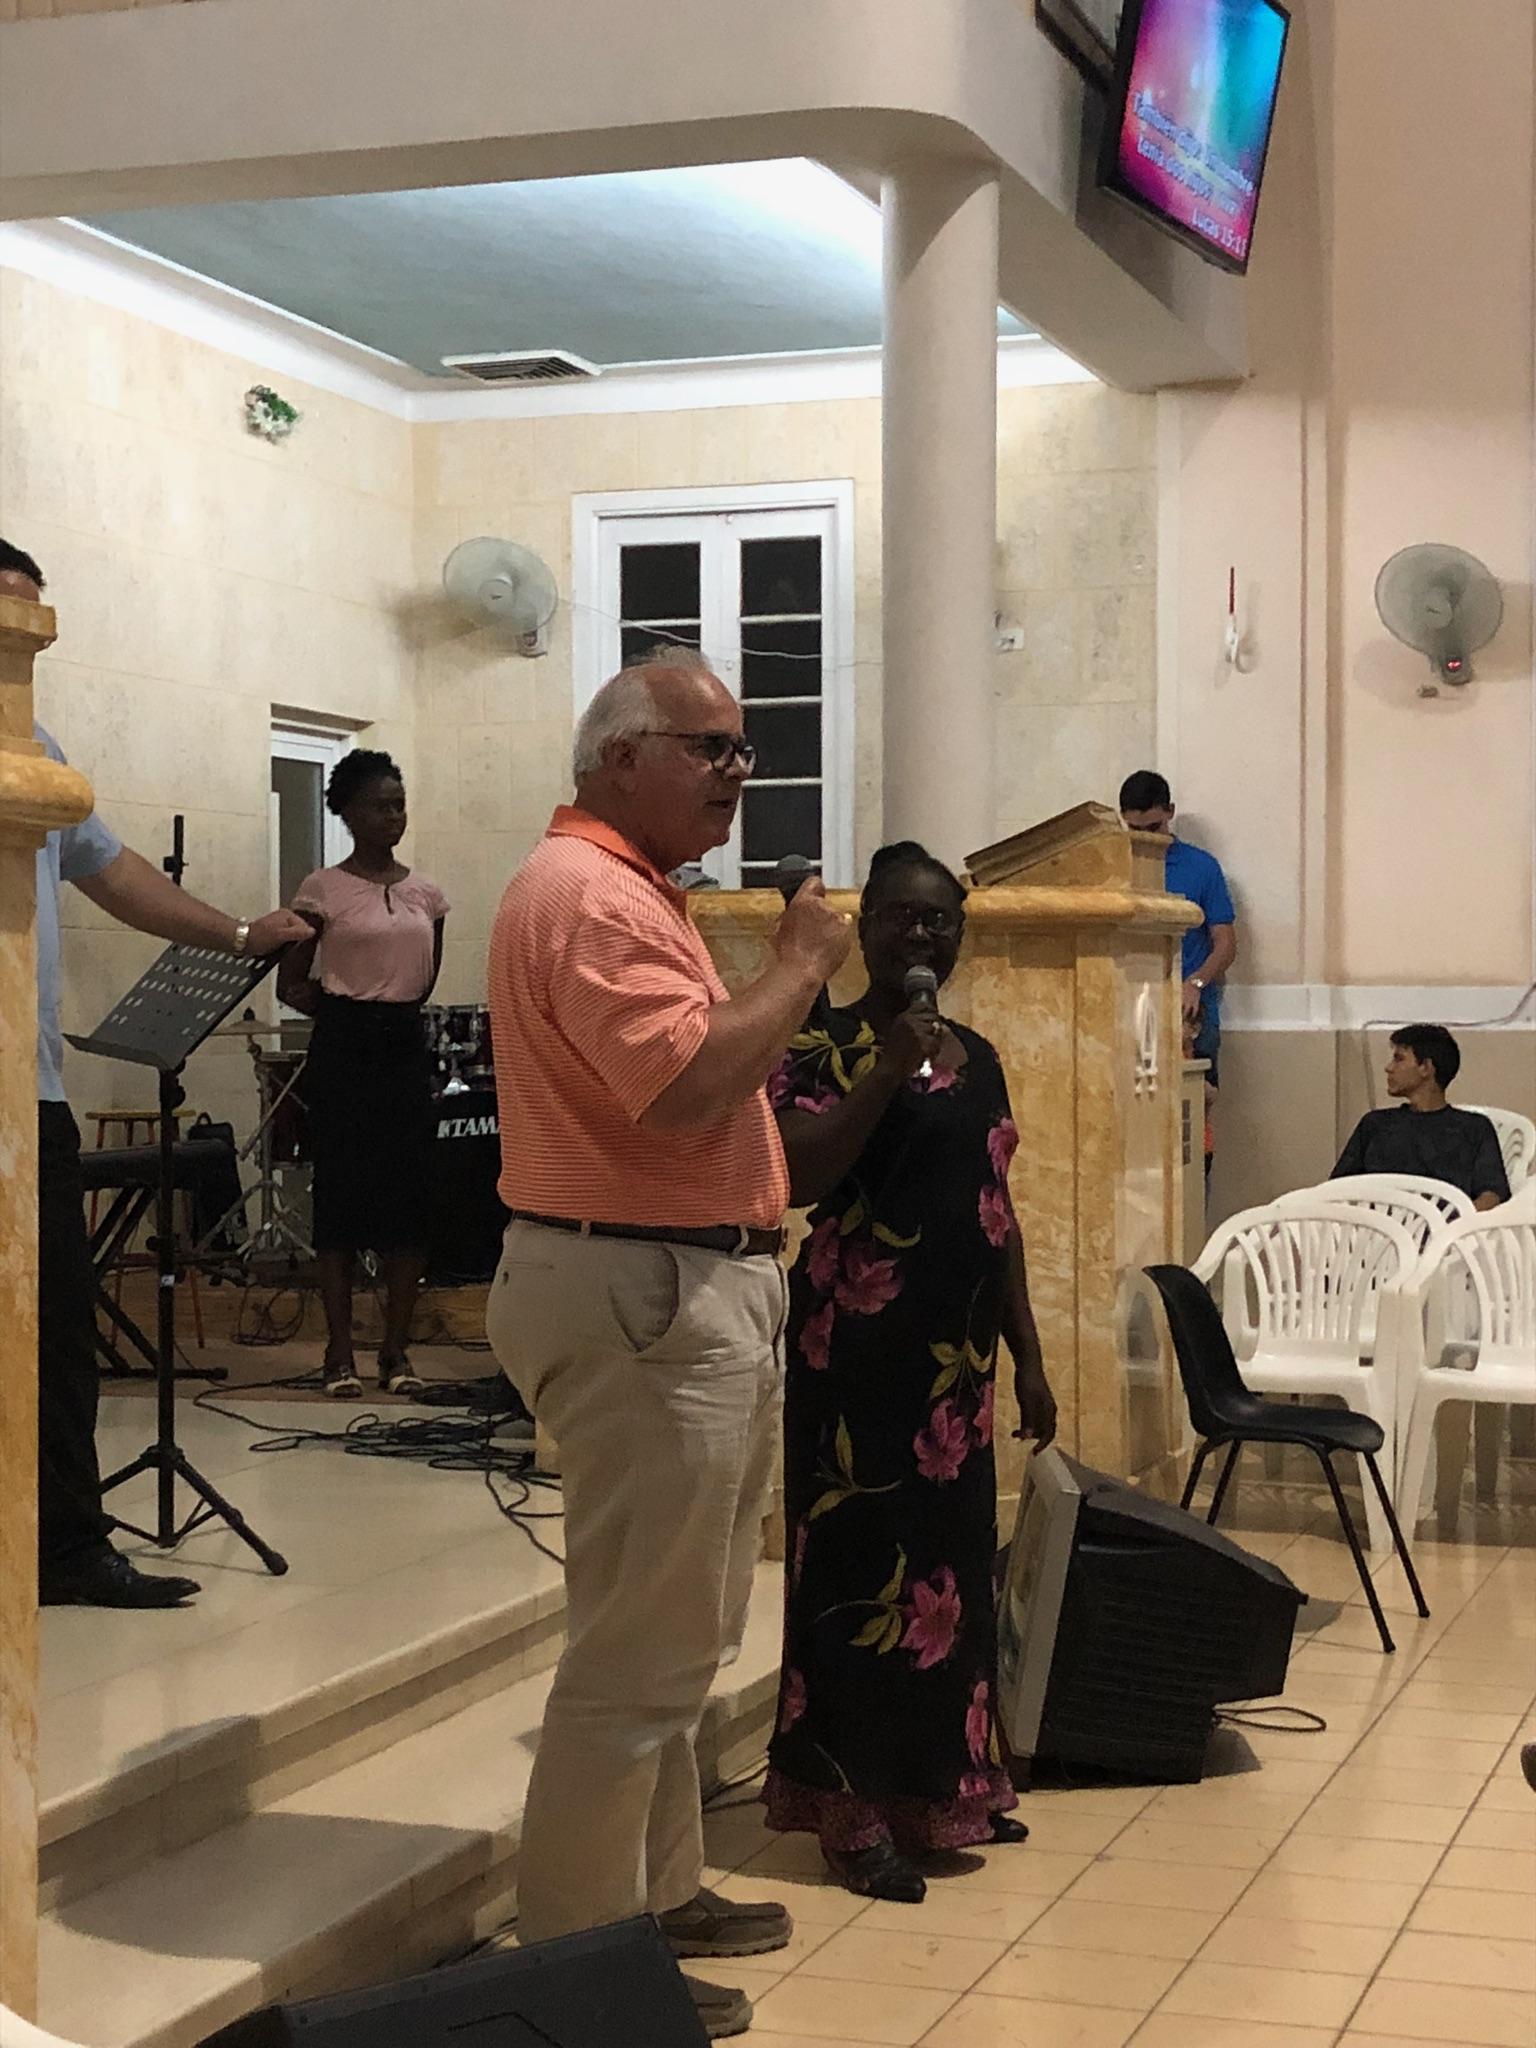 Reb Ferrell addresses the Vedado Methodist Church